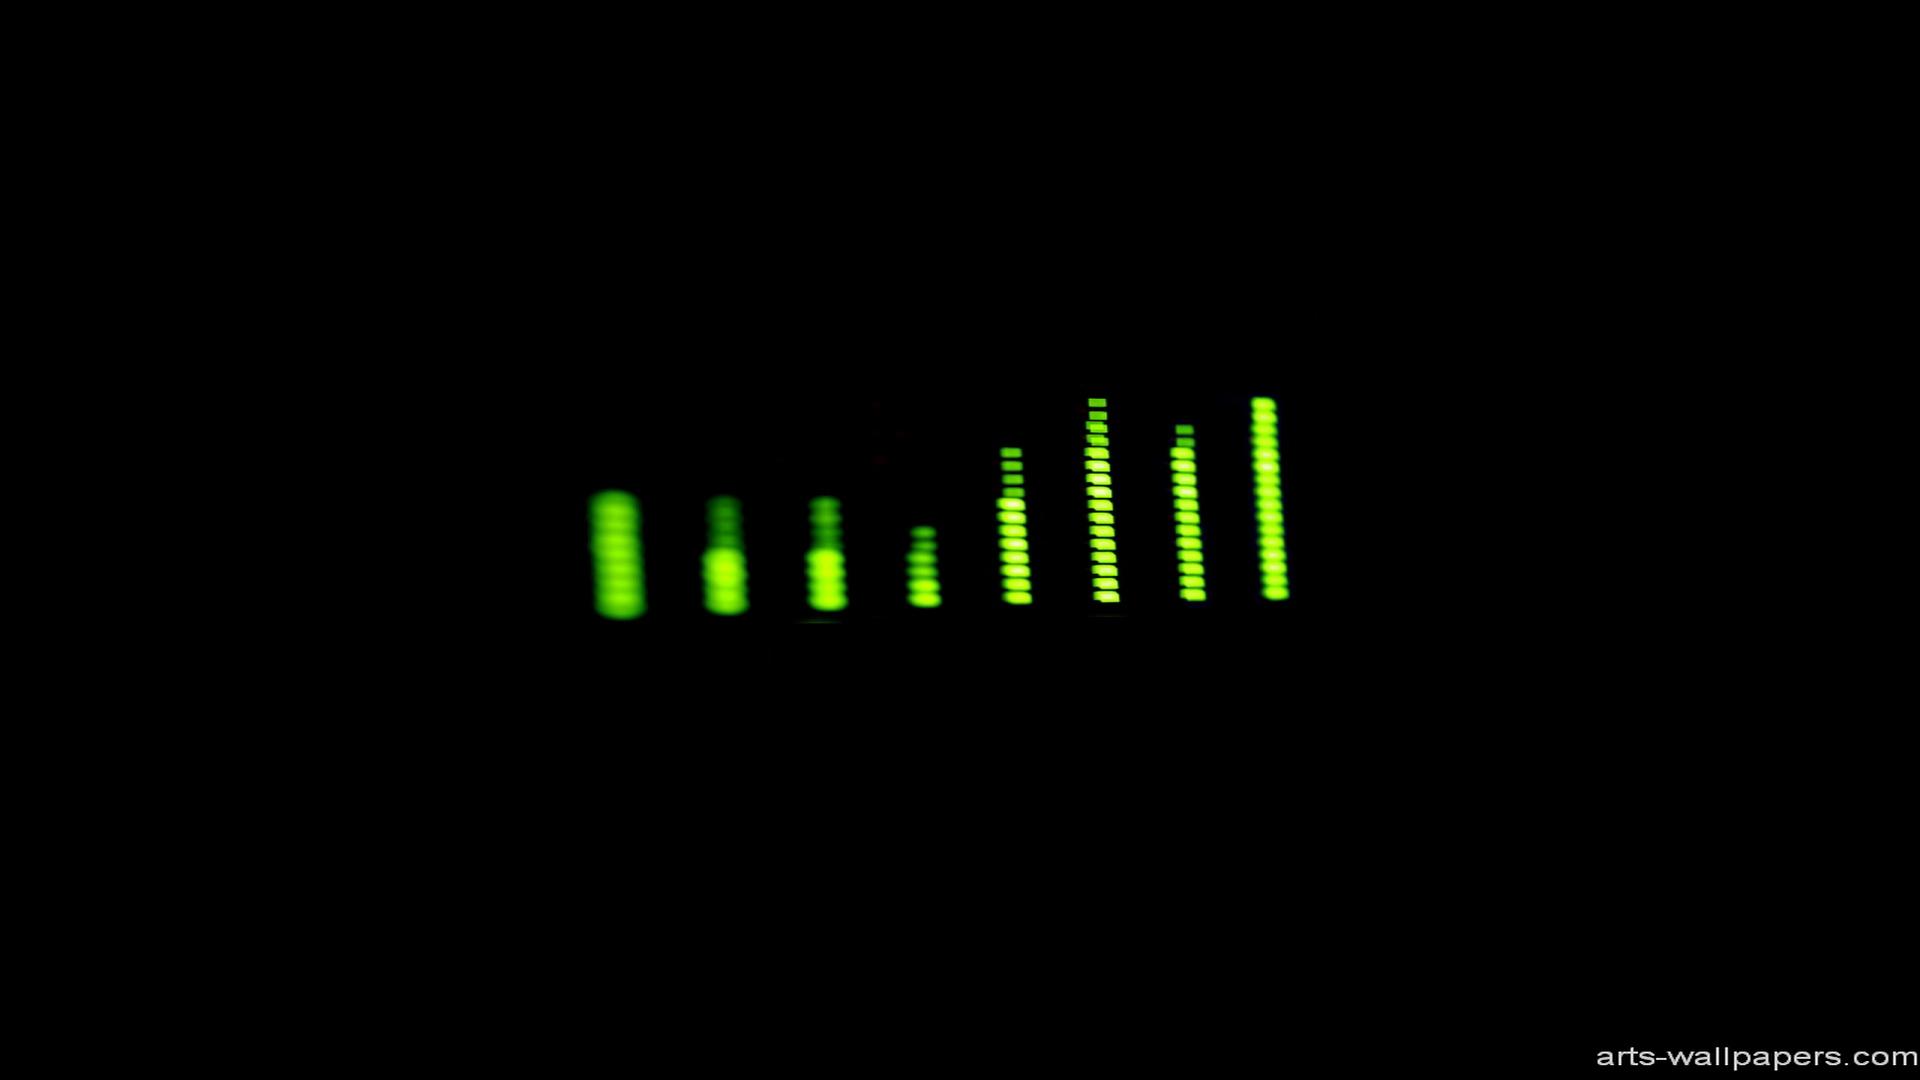 Download image 3d Desktop Wallpaper Dj Music Backgrounds PC Android 1920x1080